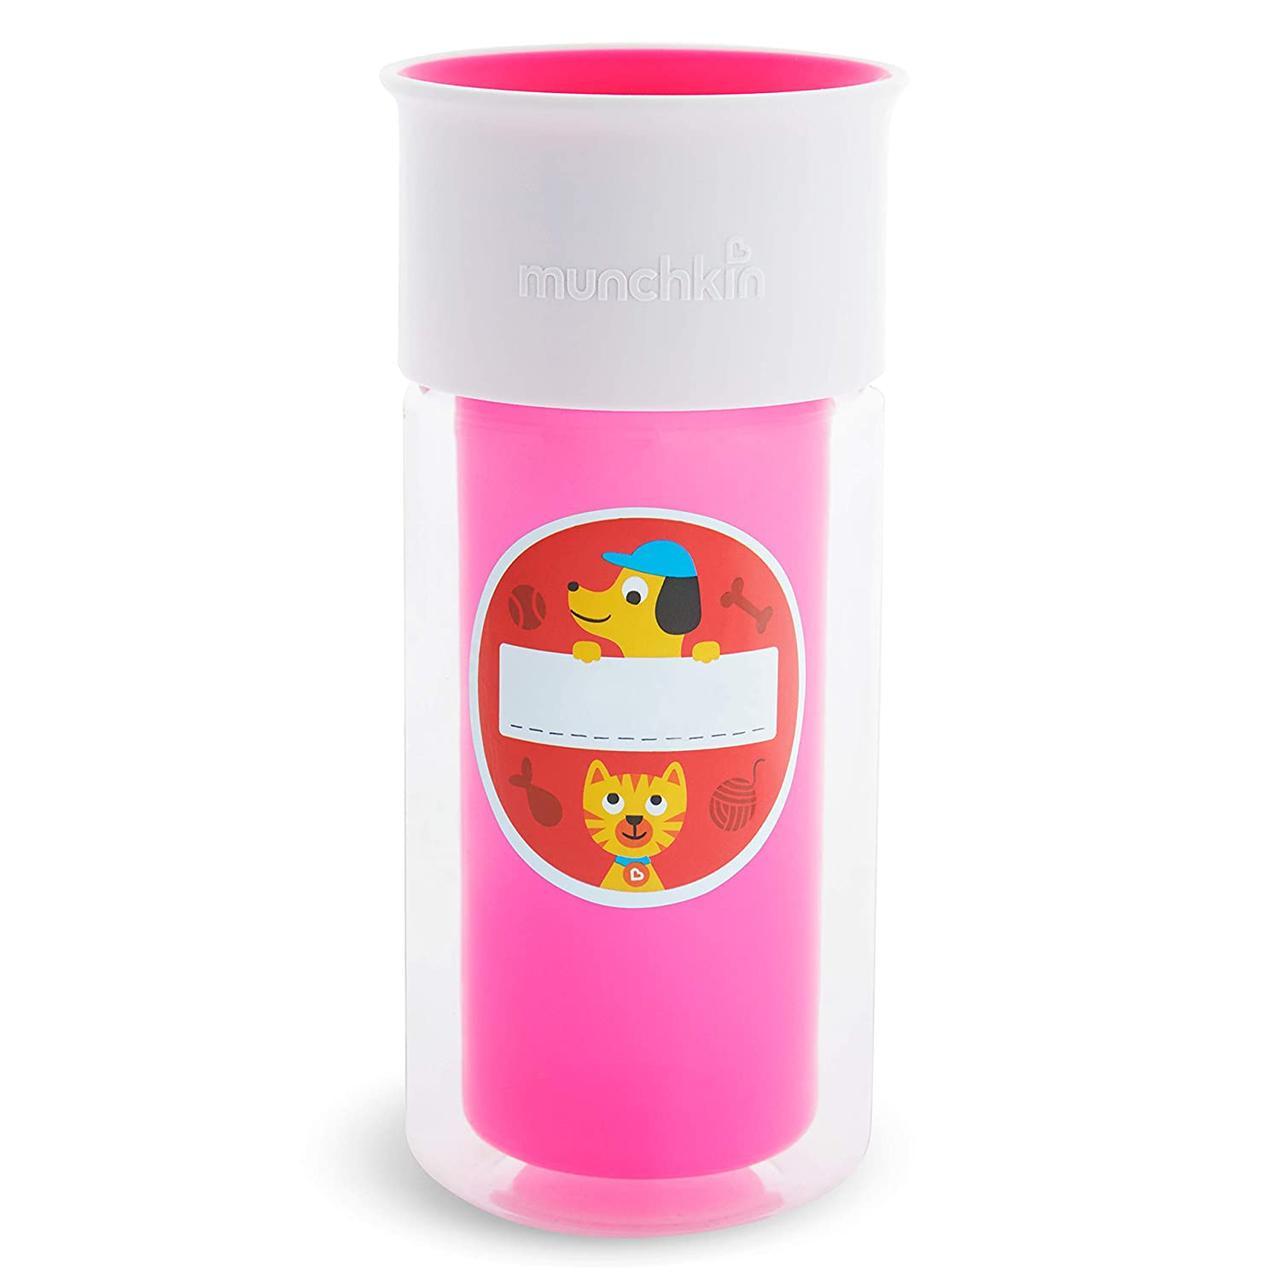 Пляшка непроливная Munchkin Miracle 360 Insulated Sticker, 266 мл